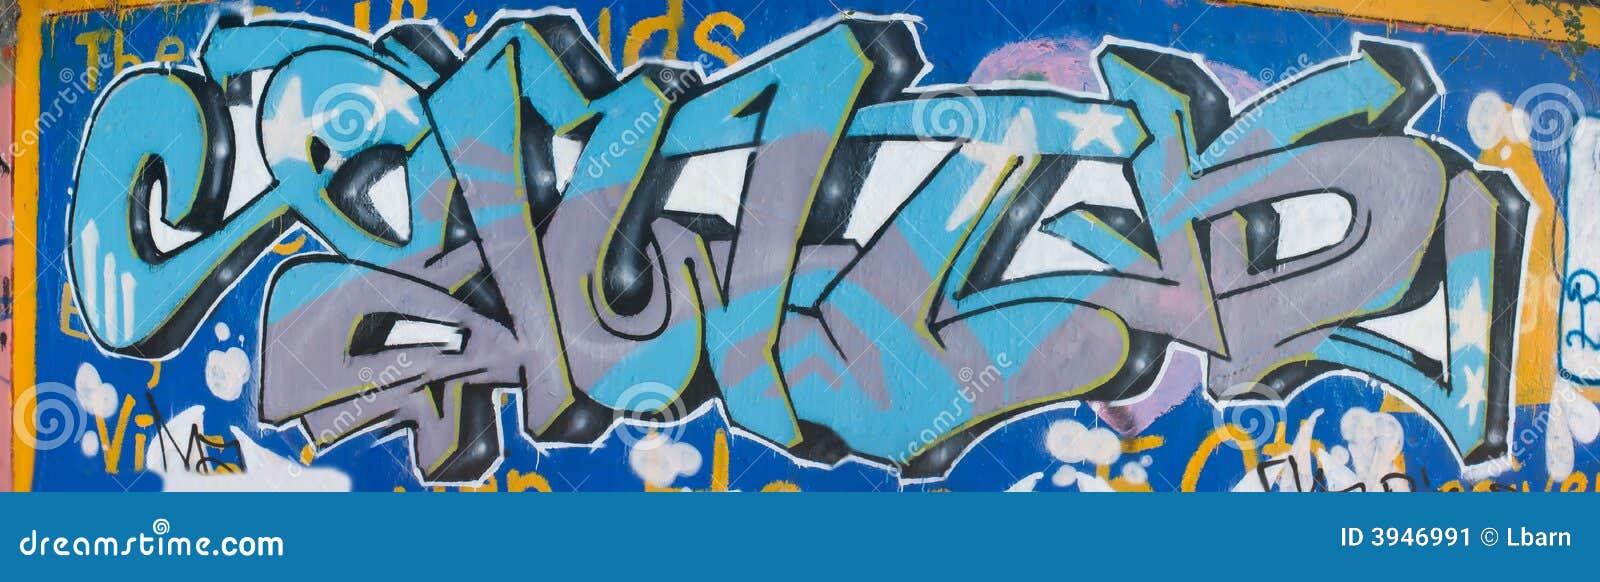 Blue Graffiti Mural Stock Image Image Of Color Grunge 3946991